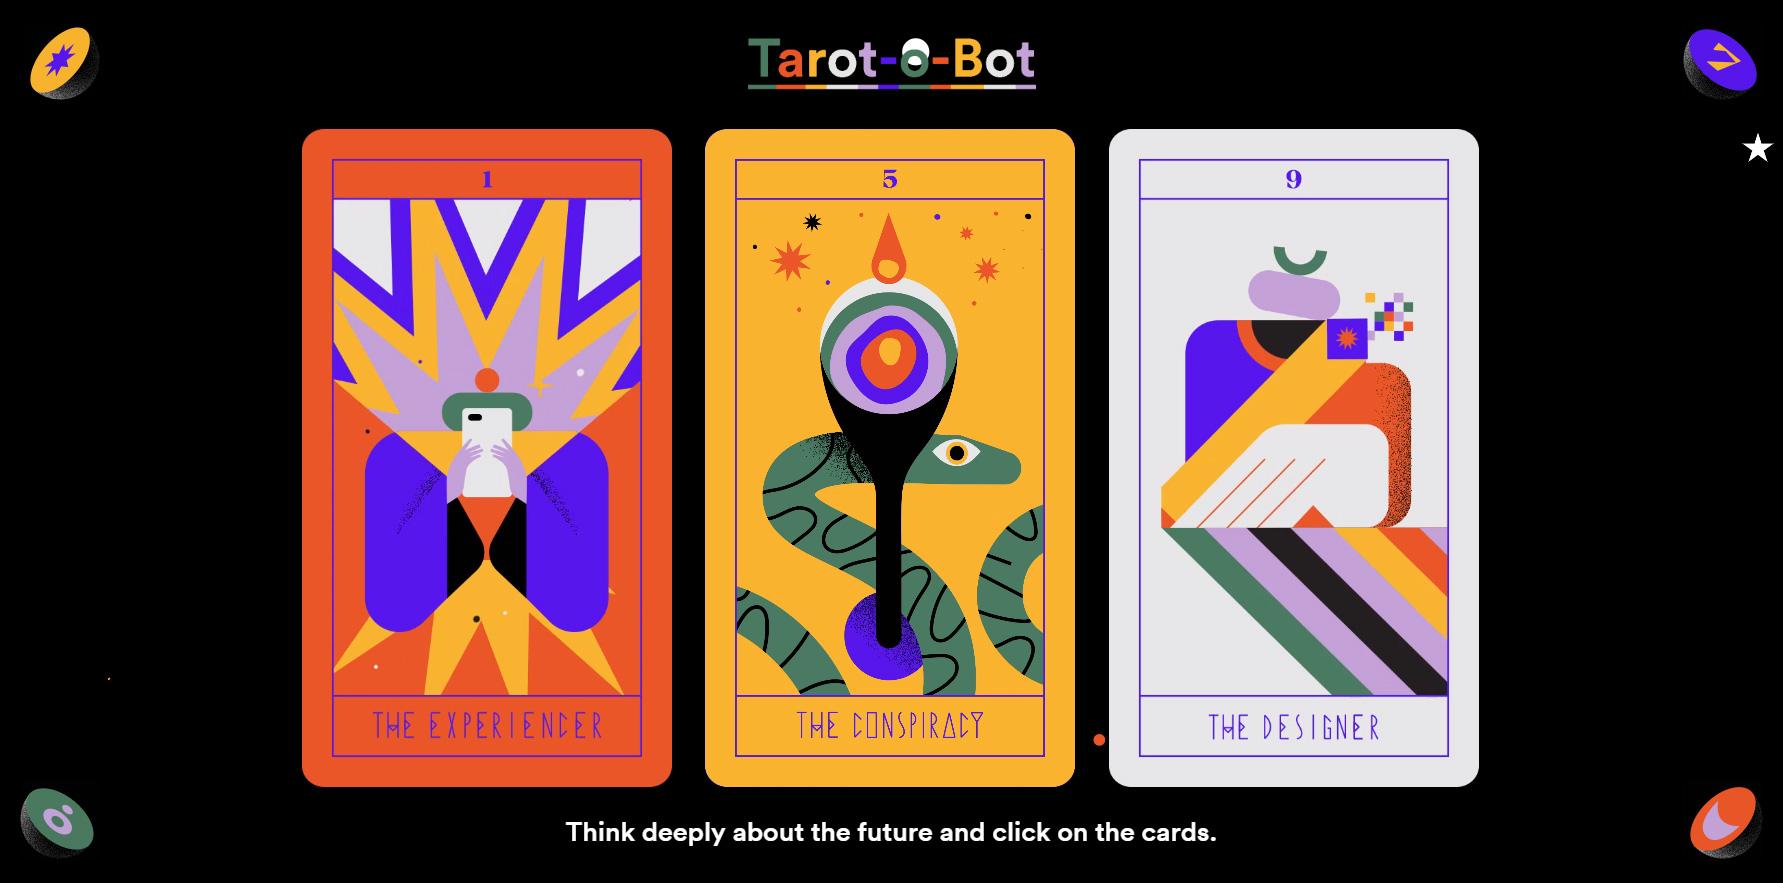 Tarot-o-bot - Website of the Day